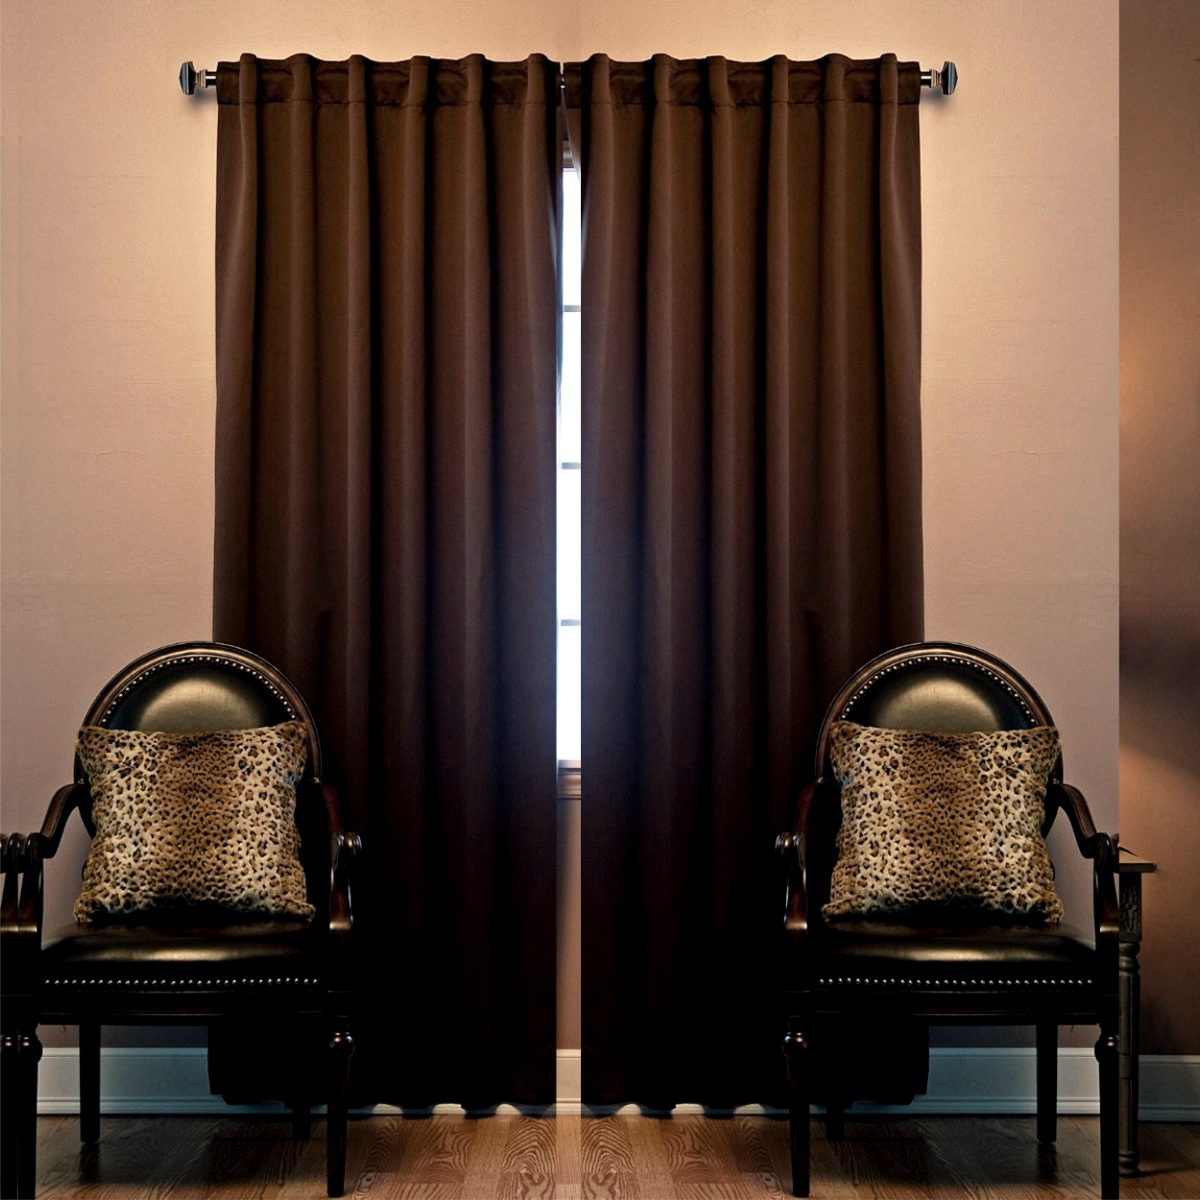 Juego de 2 cortinas black out cocoa vianney envio gratis for Cortinas black out precios